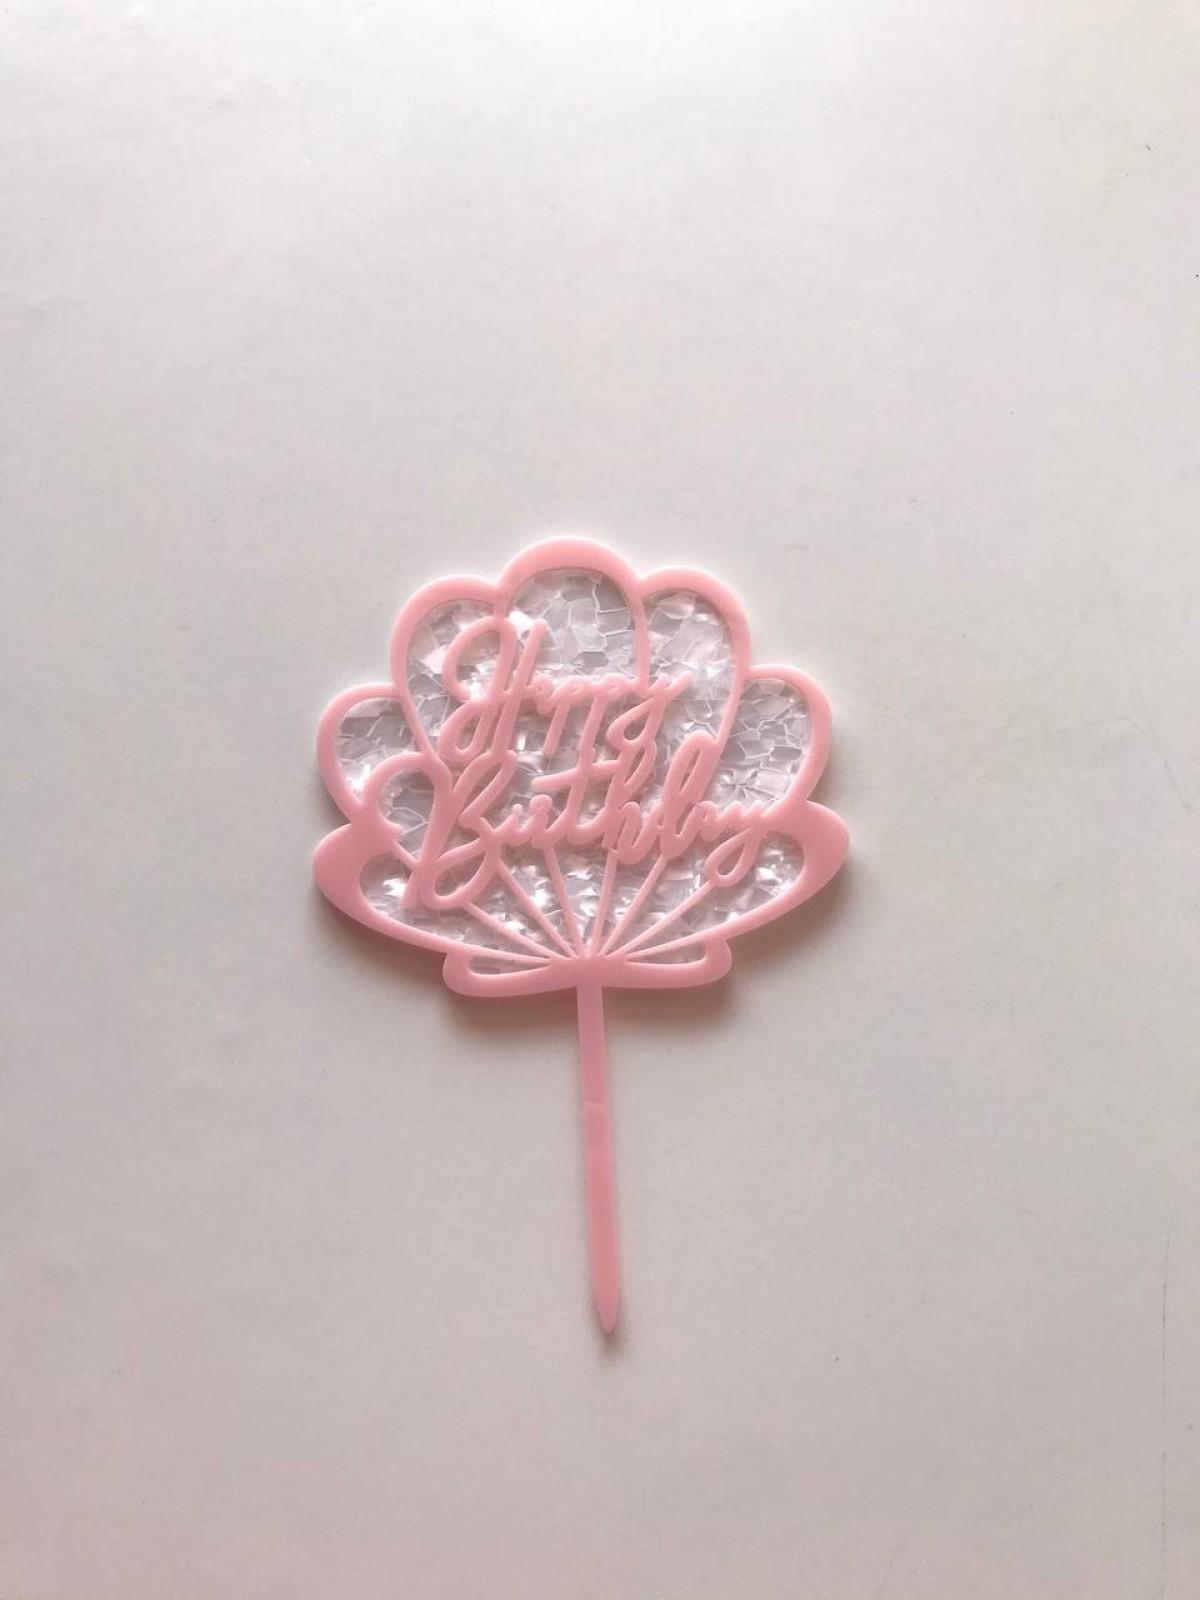 TOPPER HAPPY BIRTHDAY (SHELL) - RARA KITCHY